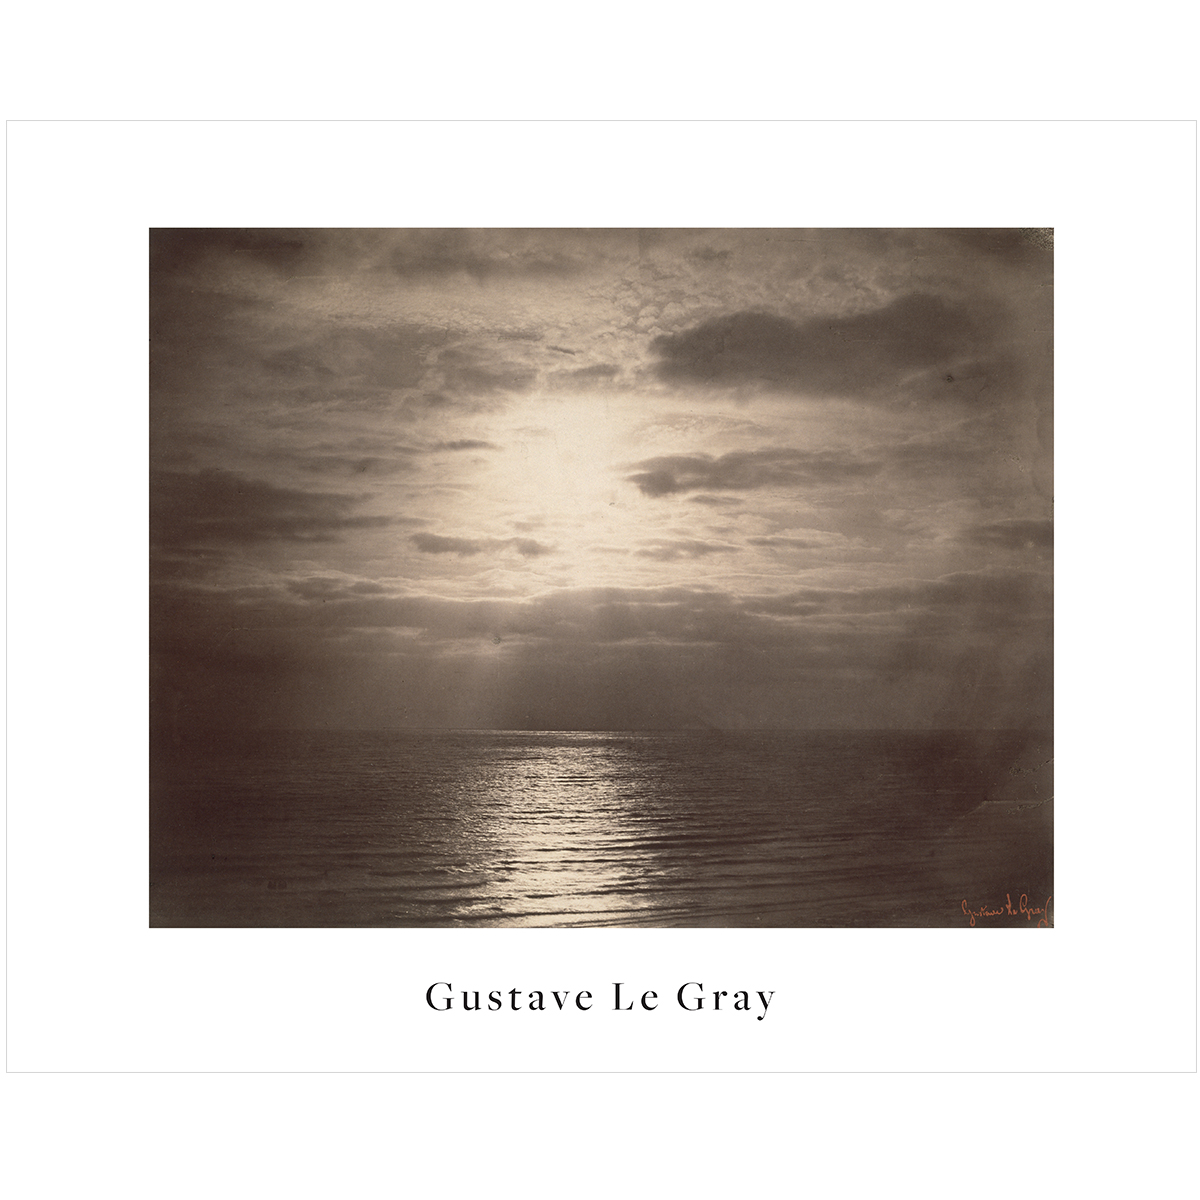 V&A Gustave Le Gray print